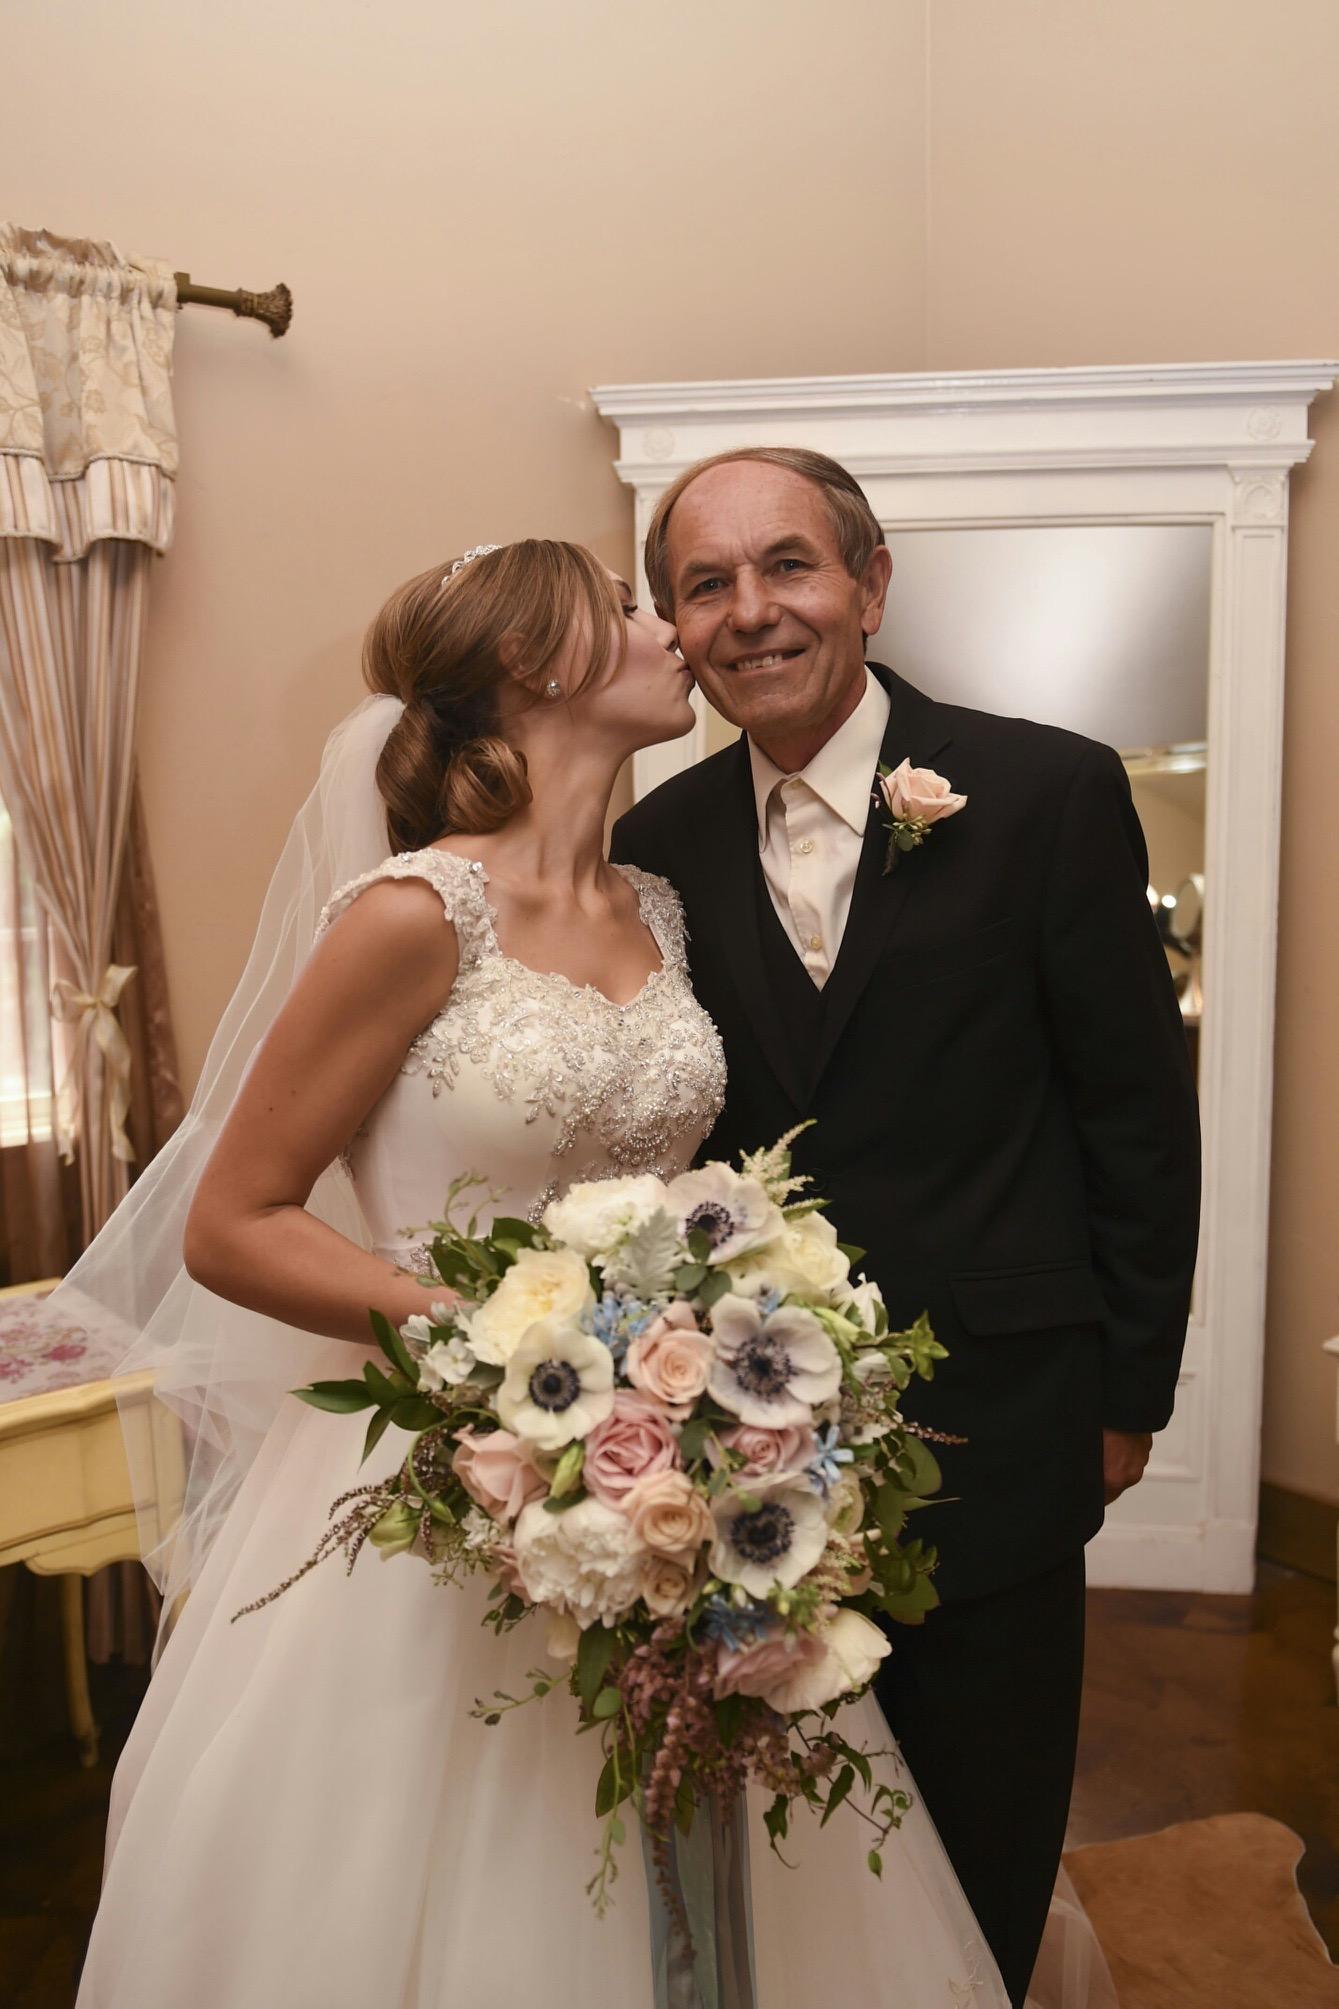 bridal_bouquet_father_newcastle_wedding_gardens_violette_fleurs.jpg